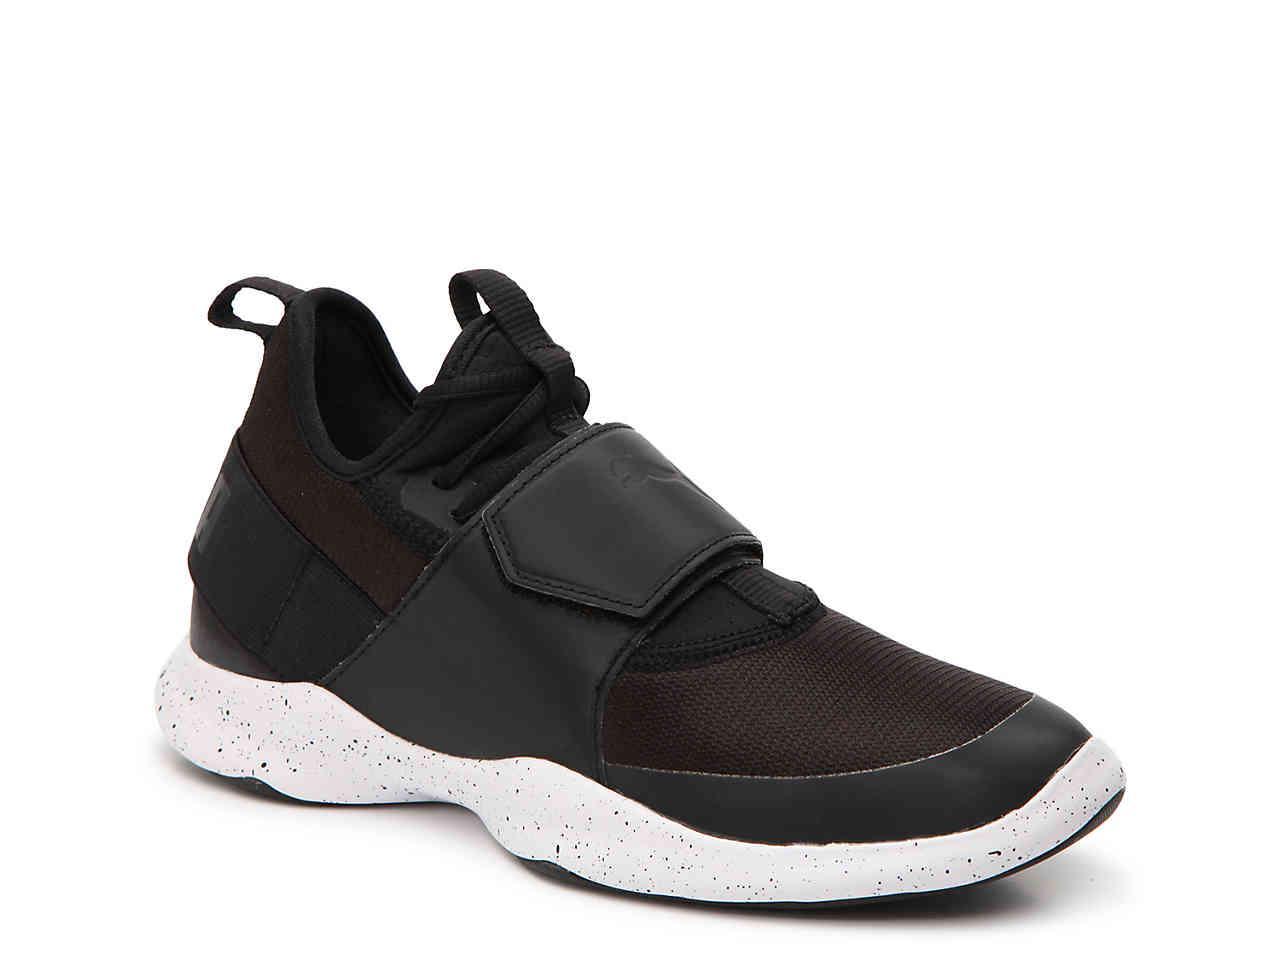 Lyst - PUMA Dare Lightweight Training Shoe in Black cb2104498e80